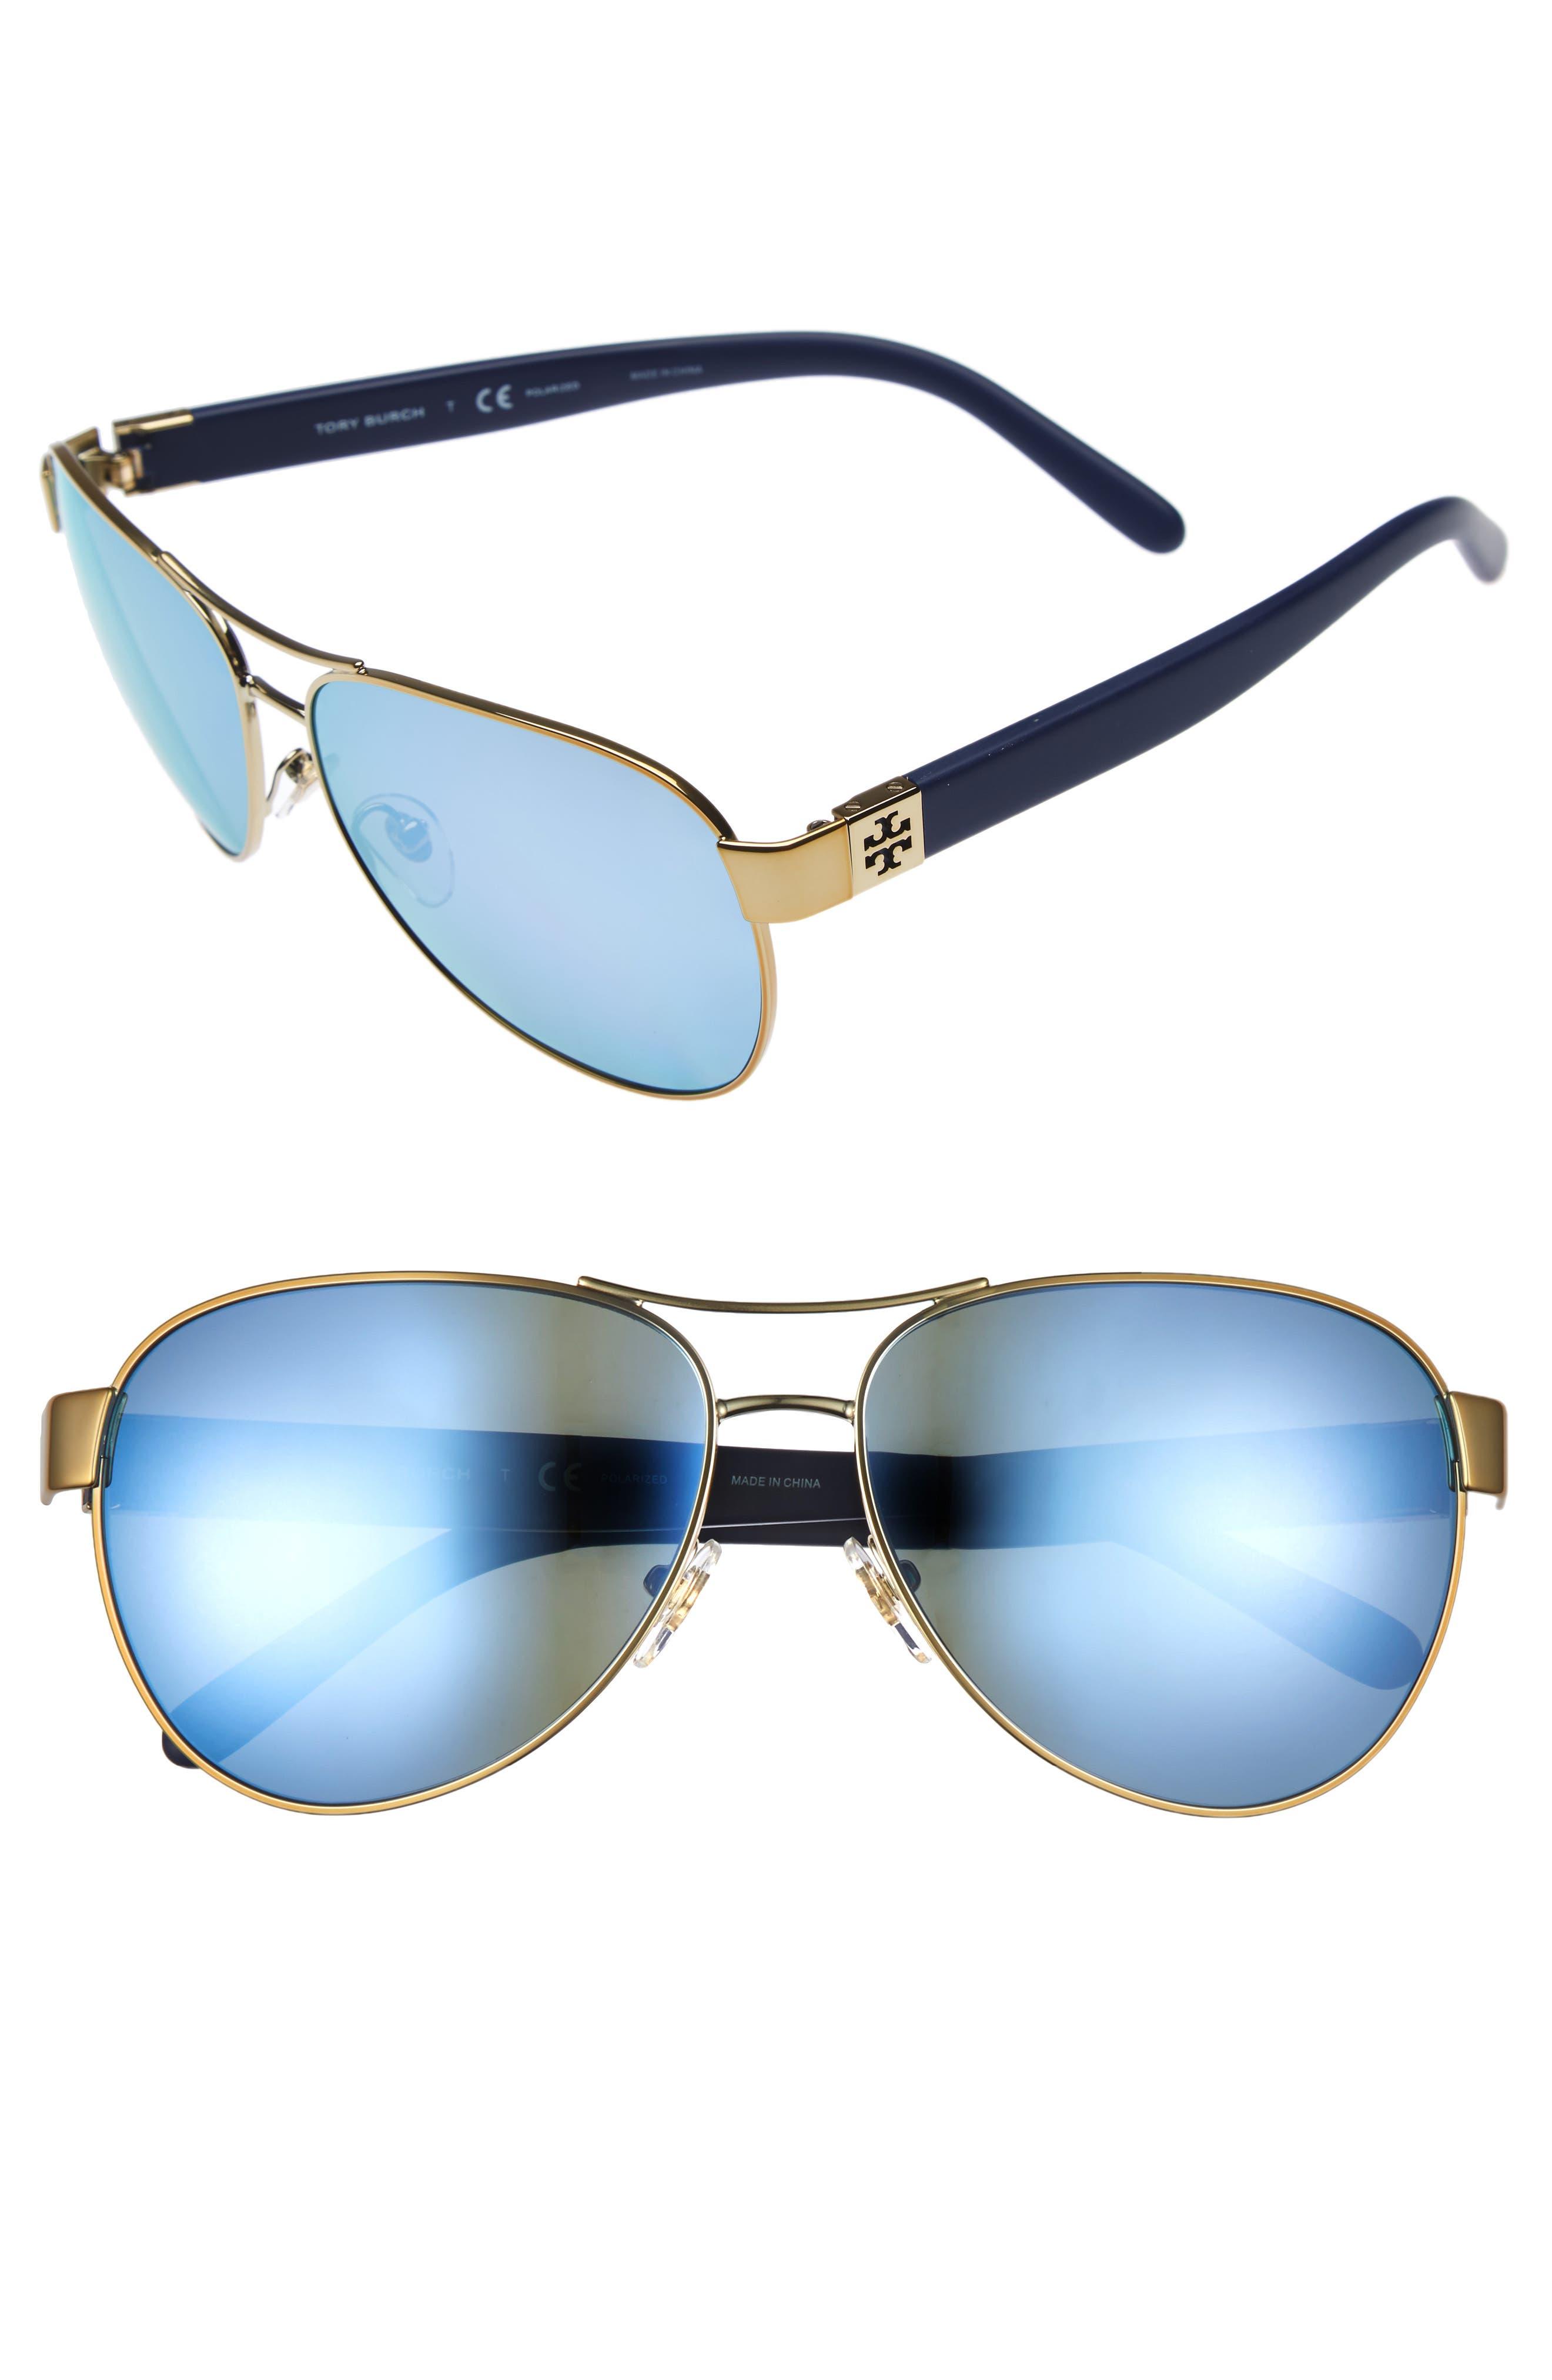 60mm Polarized Aviator Sunglasses,                             Main thumbnail 1, color,                             Gold